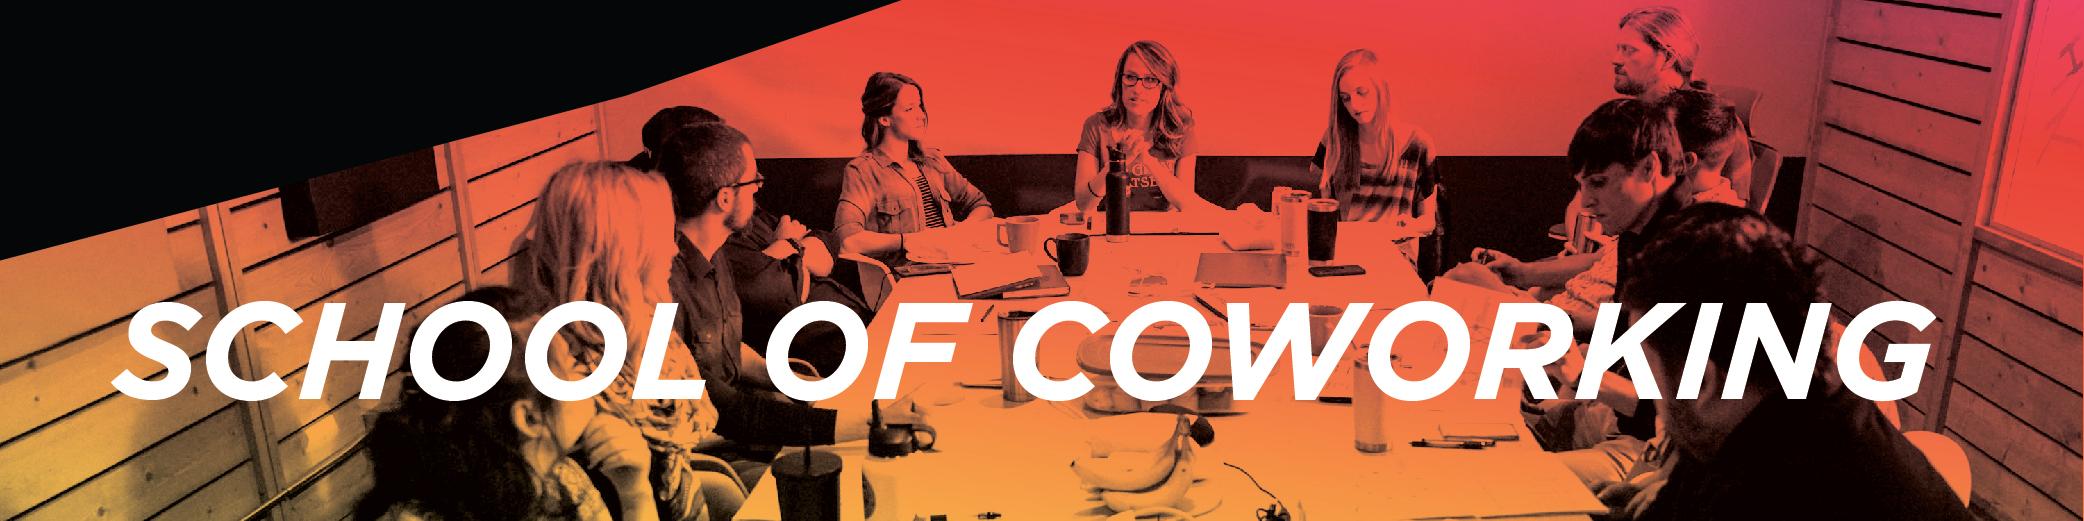 Header for proximity School of Coworking